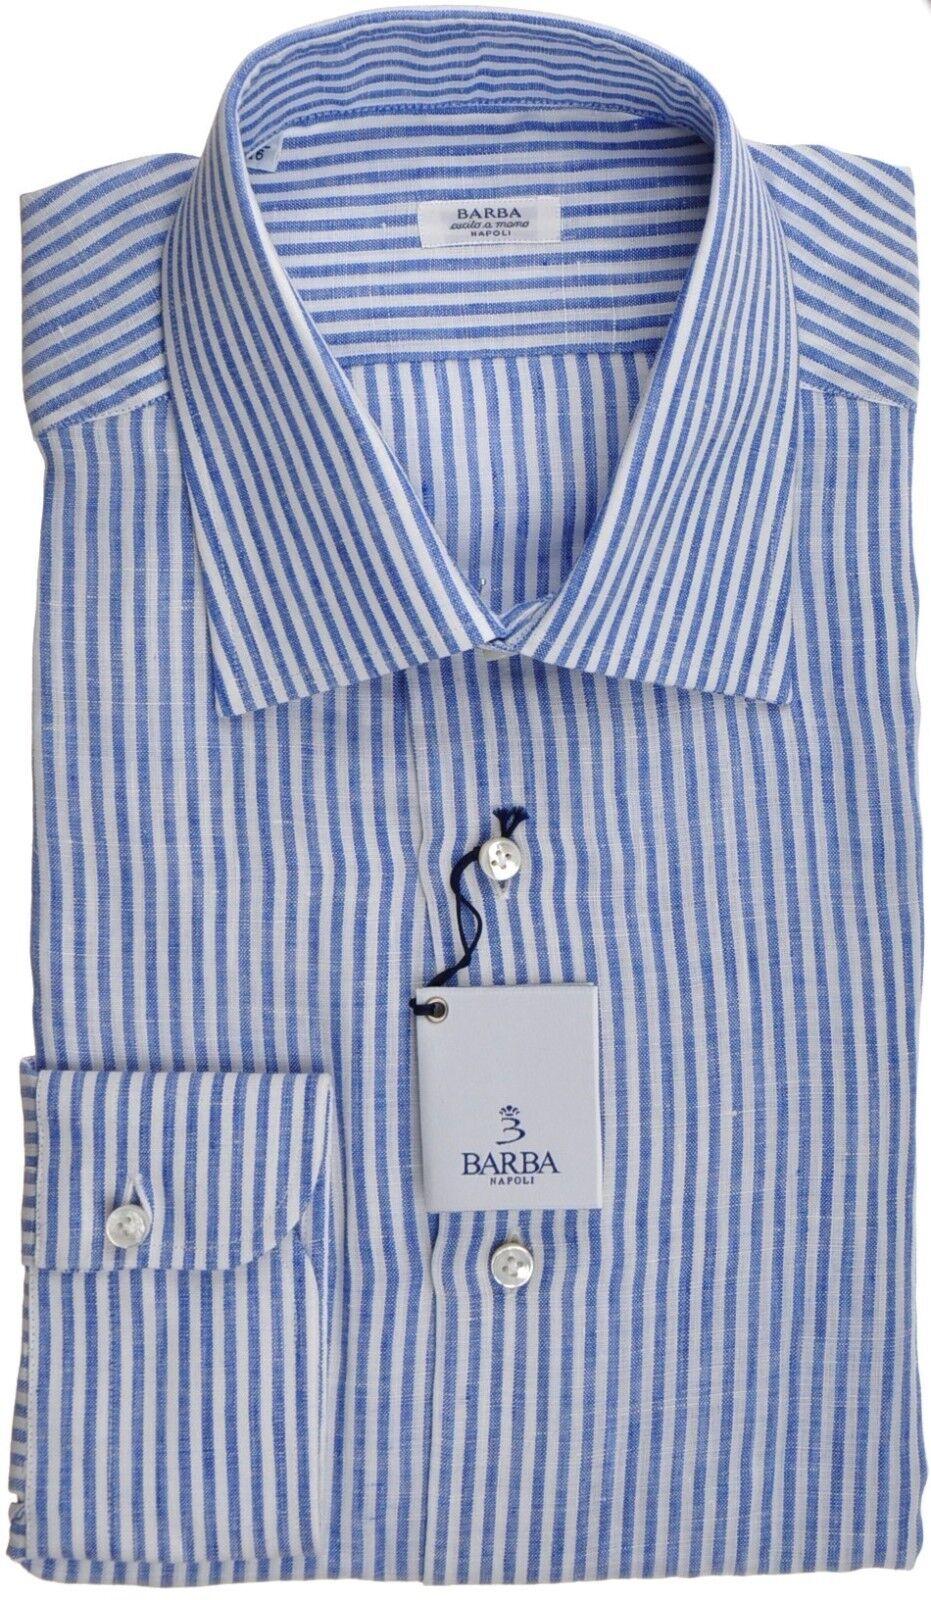 Barba Napoli Dress Shirt Linen 17 43 Blau Weiß Stripe 11SH0178 325